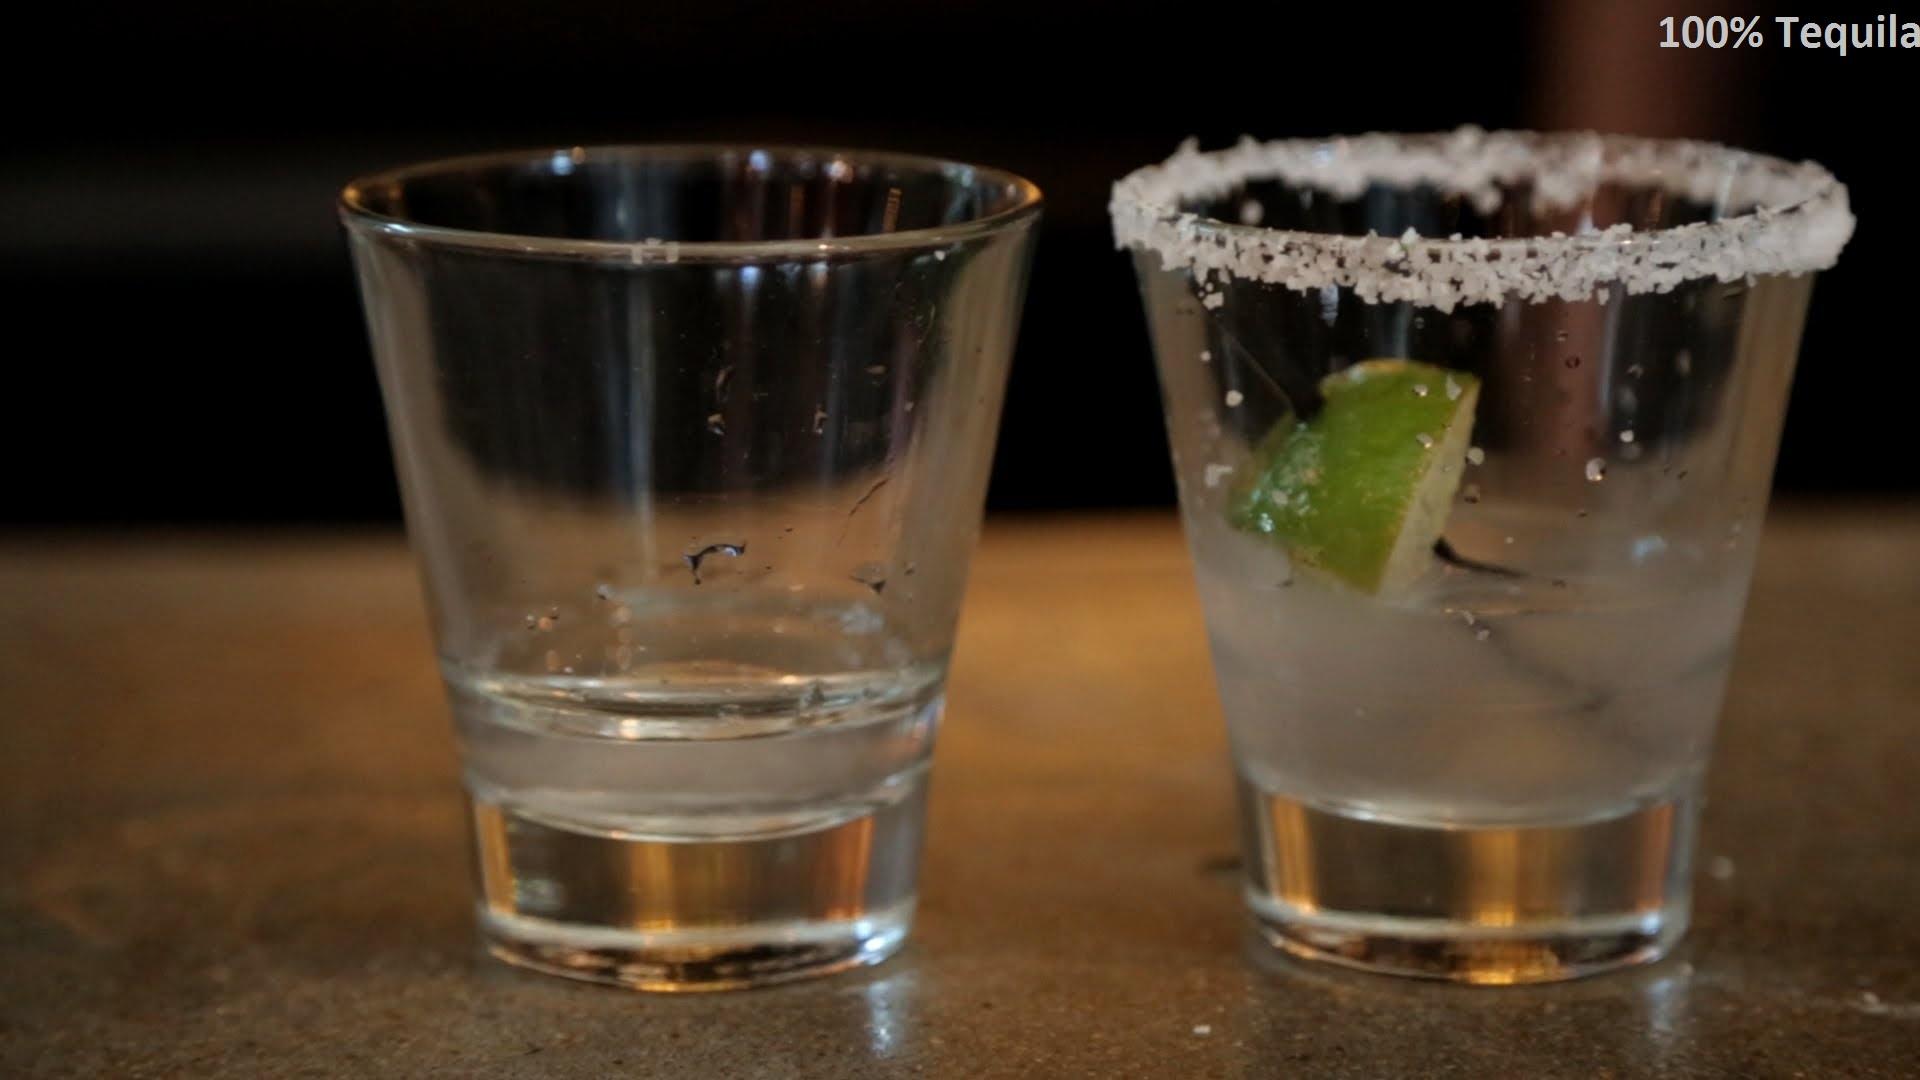 100% Tequila Market Overview By ( Jose Cuervo, Sauza, Patrn, Juarez, 1800 Tequila, El Jimador Family, Don Julio, Familia Camarena Tequila, Herradura ) With Latest Trend, Industry Growth & Product Development photo